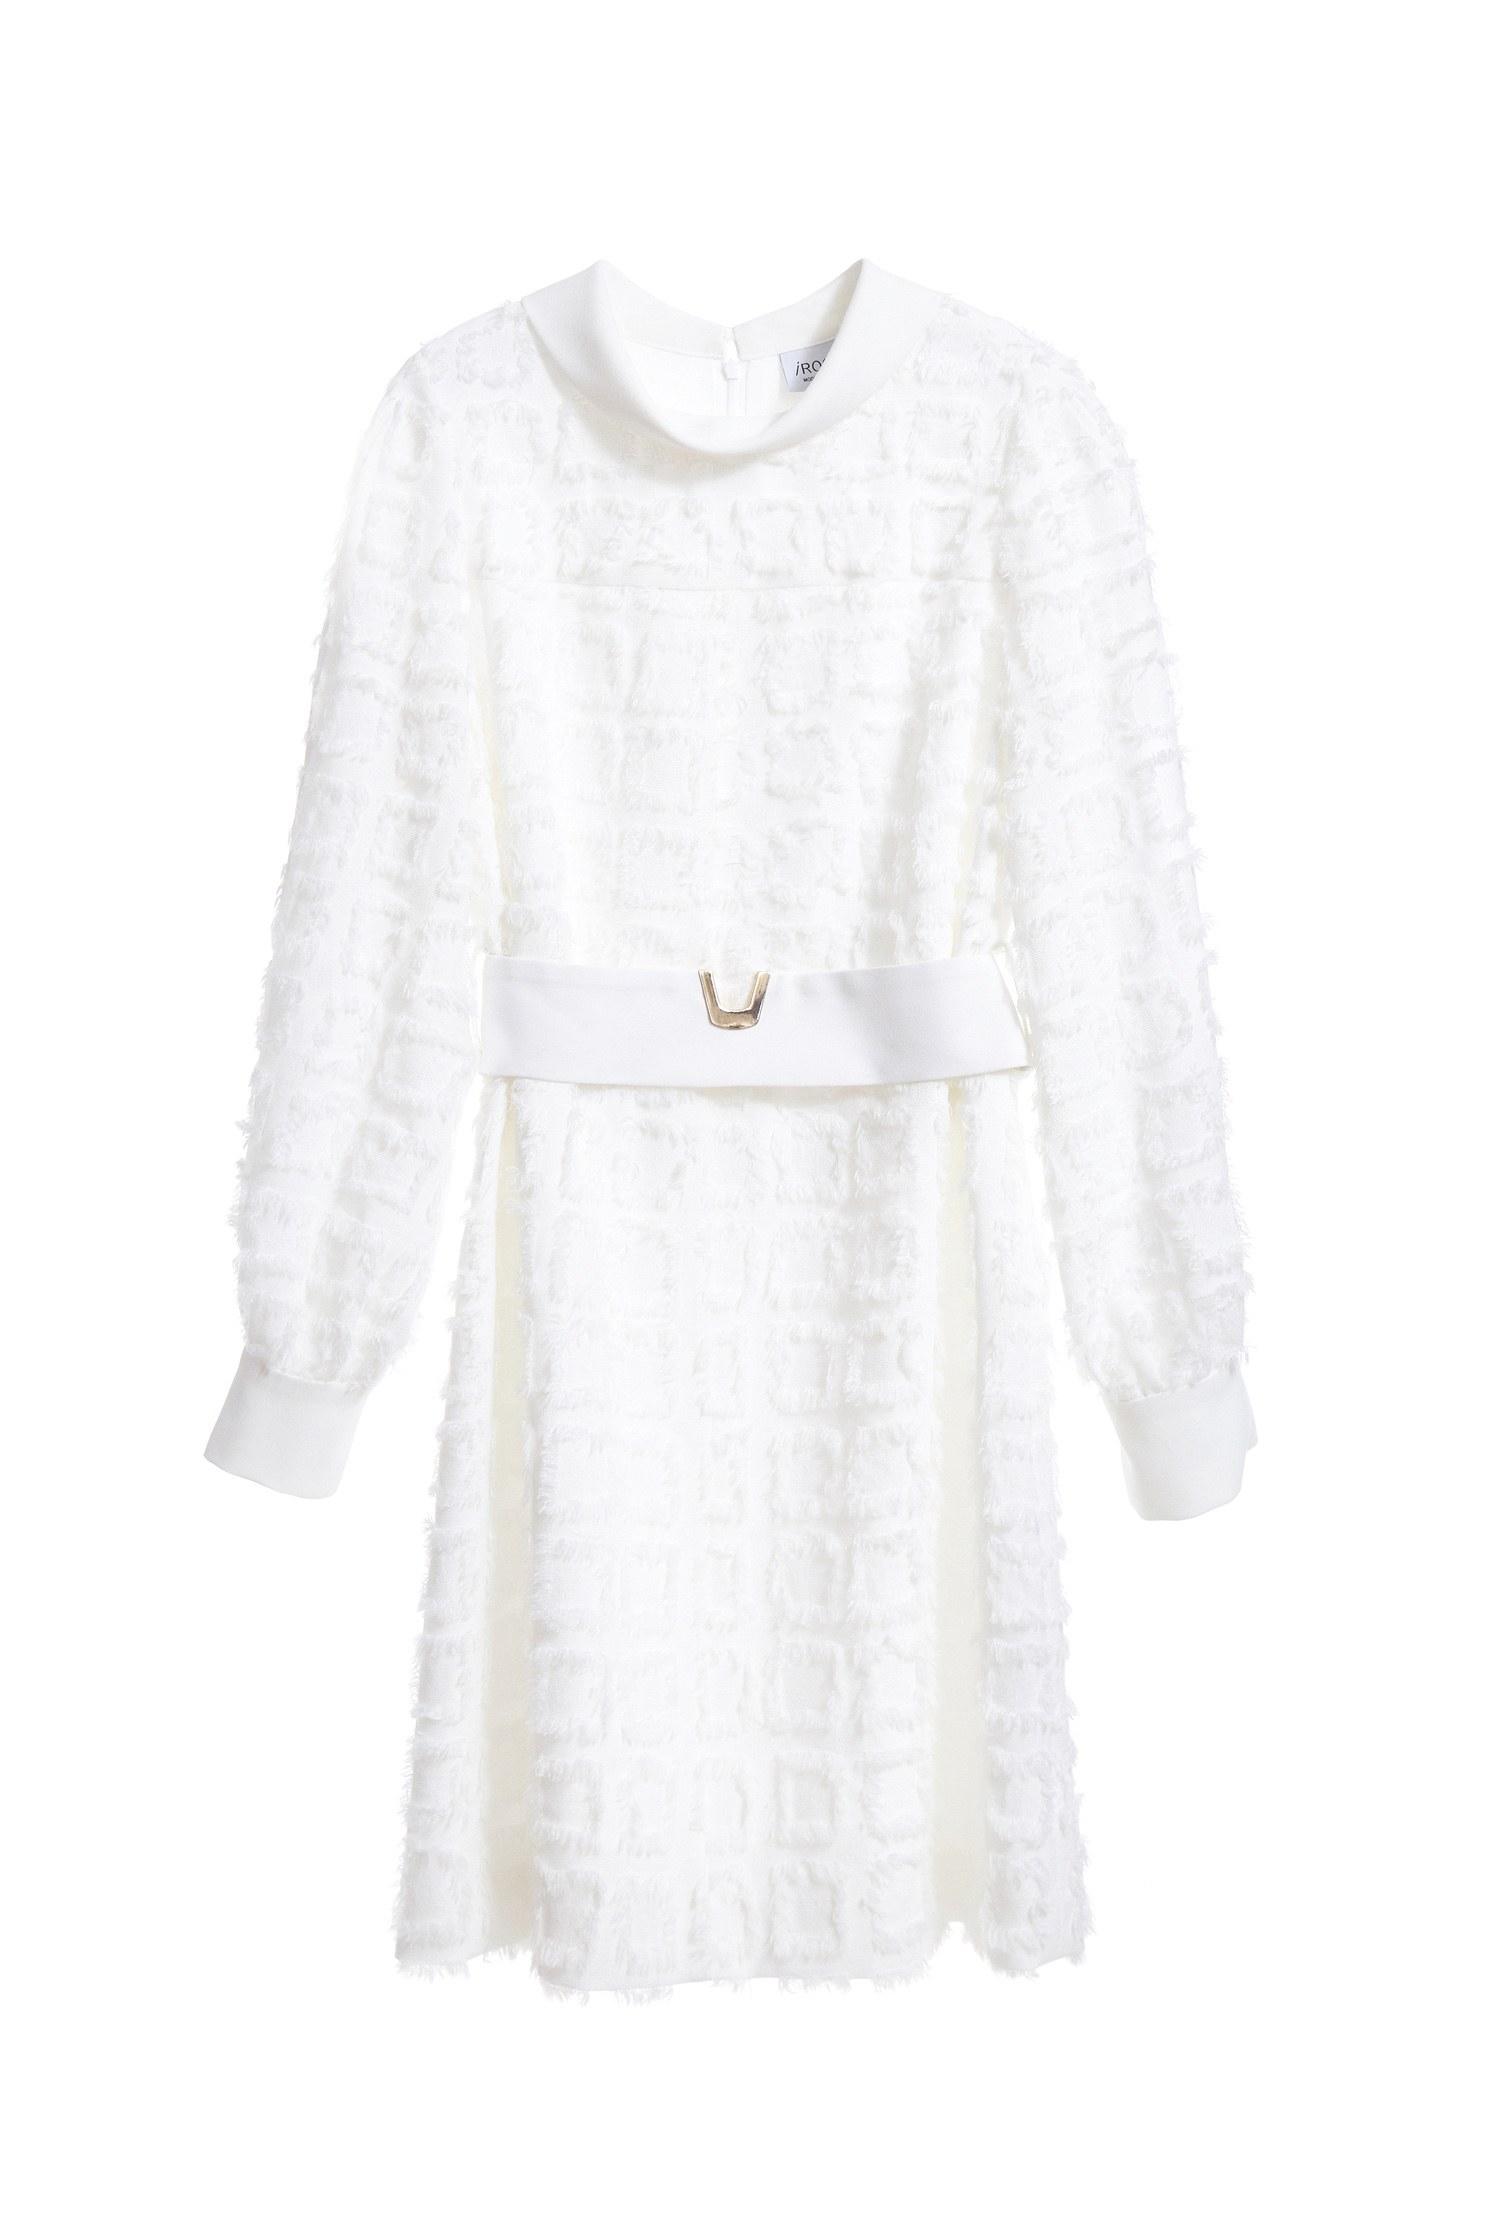 Romantic see-through lace chiffon dress